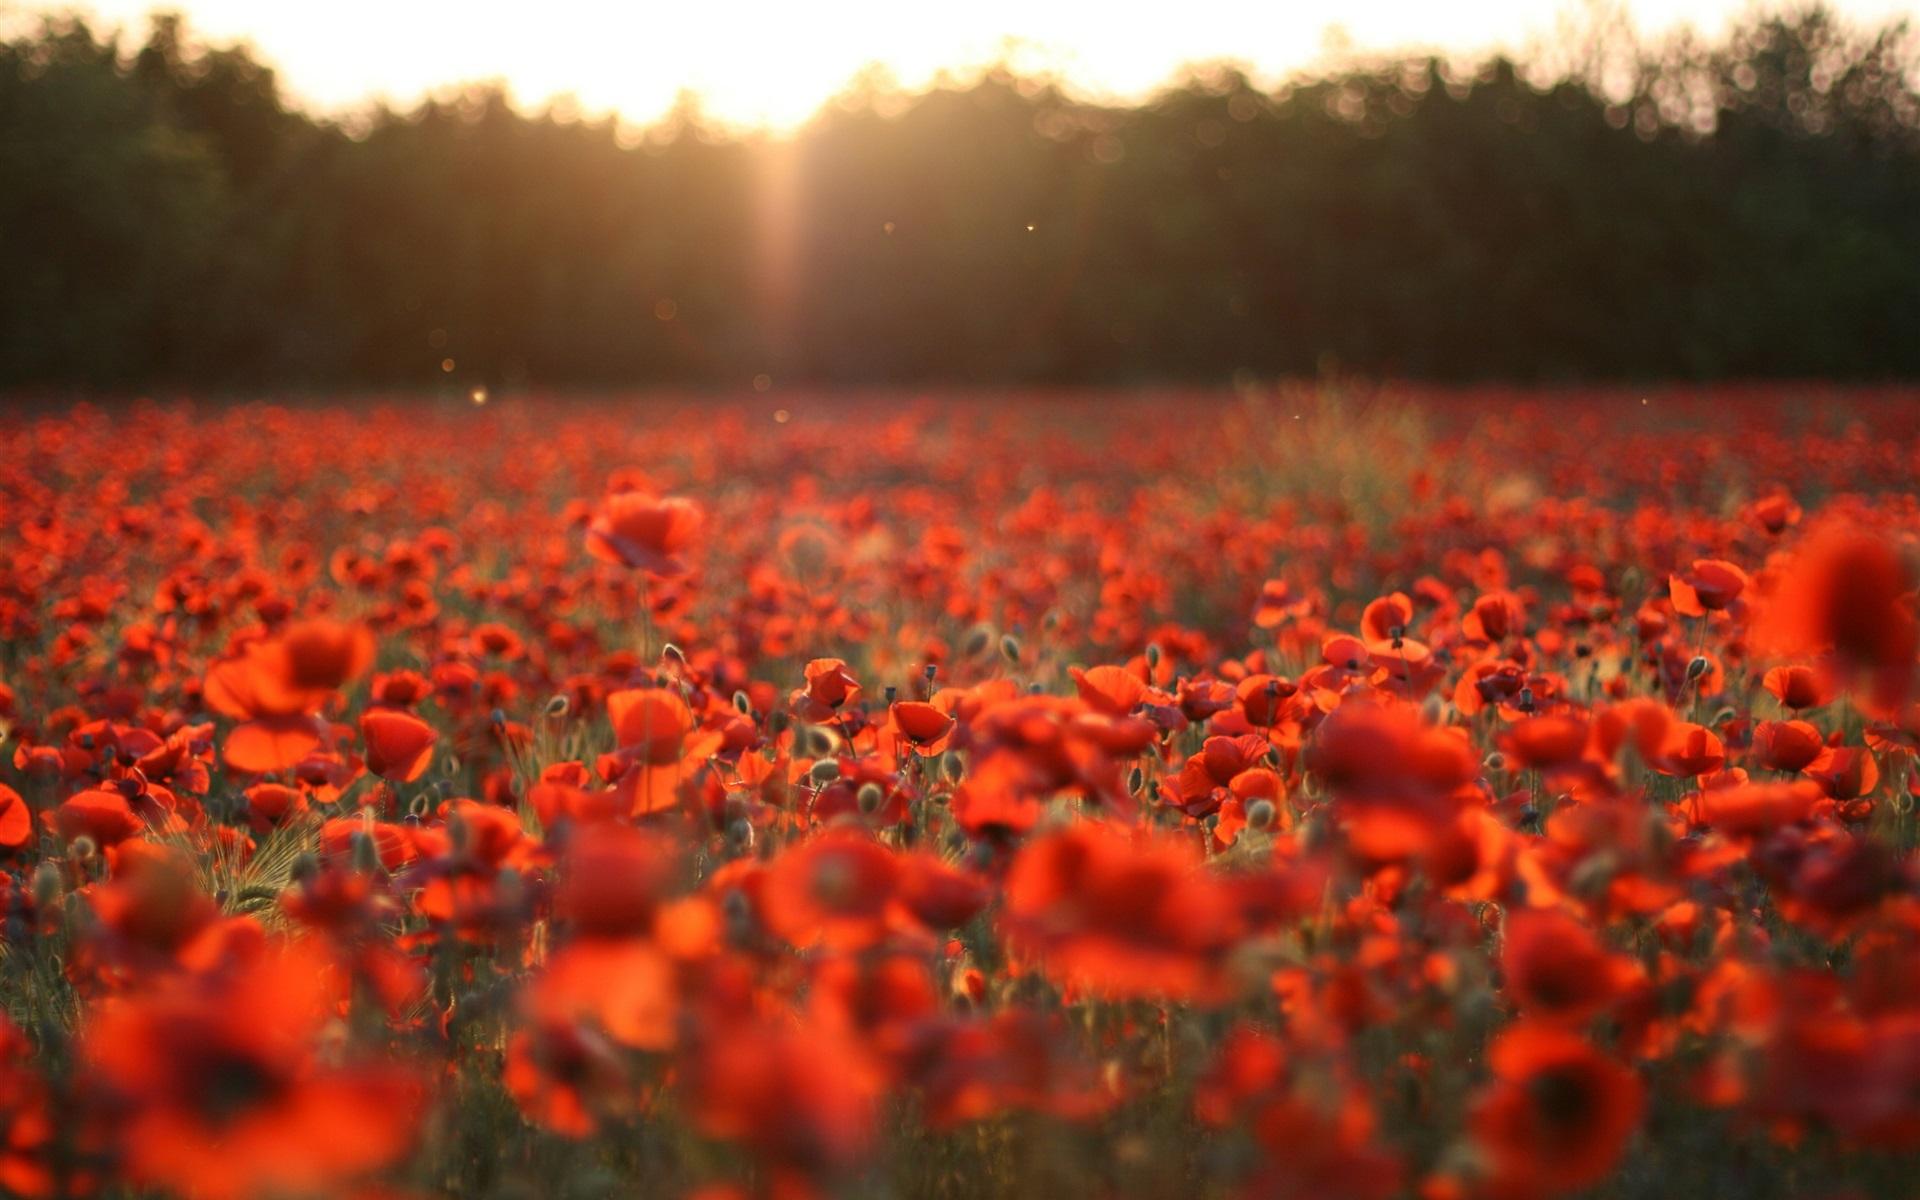 flowers field sun rays Wallpaper | 1920x1200 resolution wallpaper HD Wide Wallpaper for Widescreen